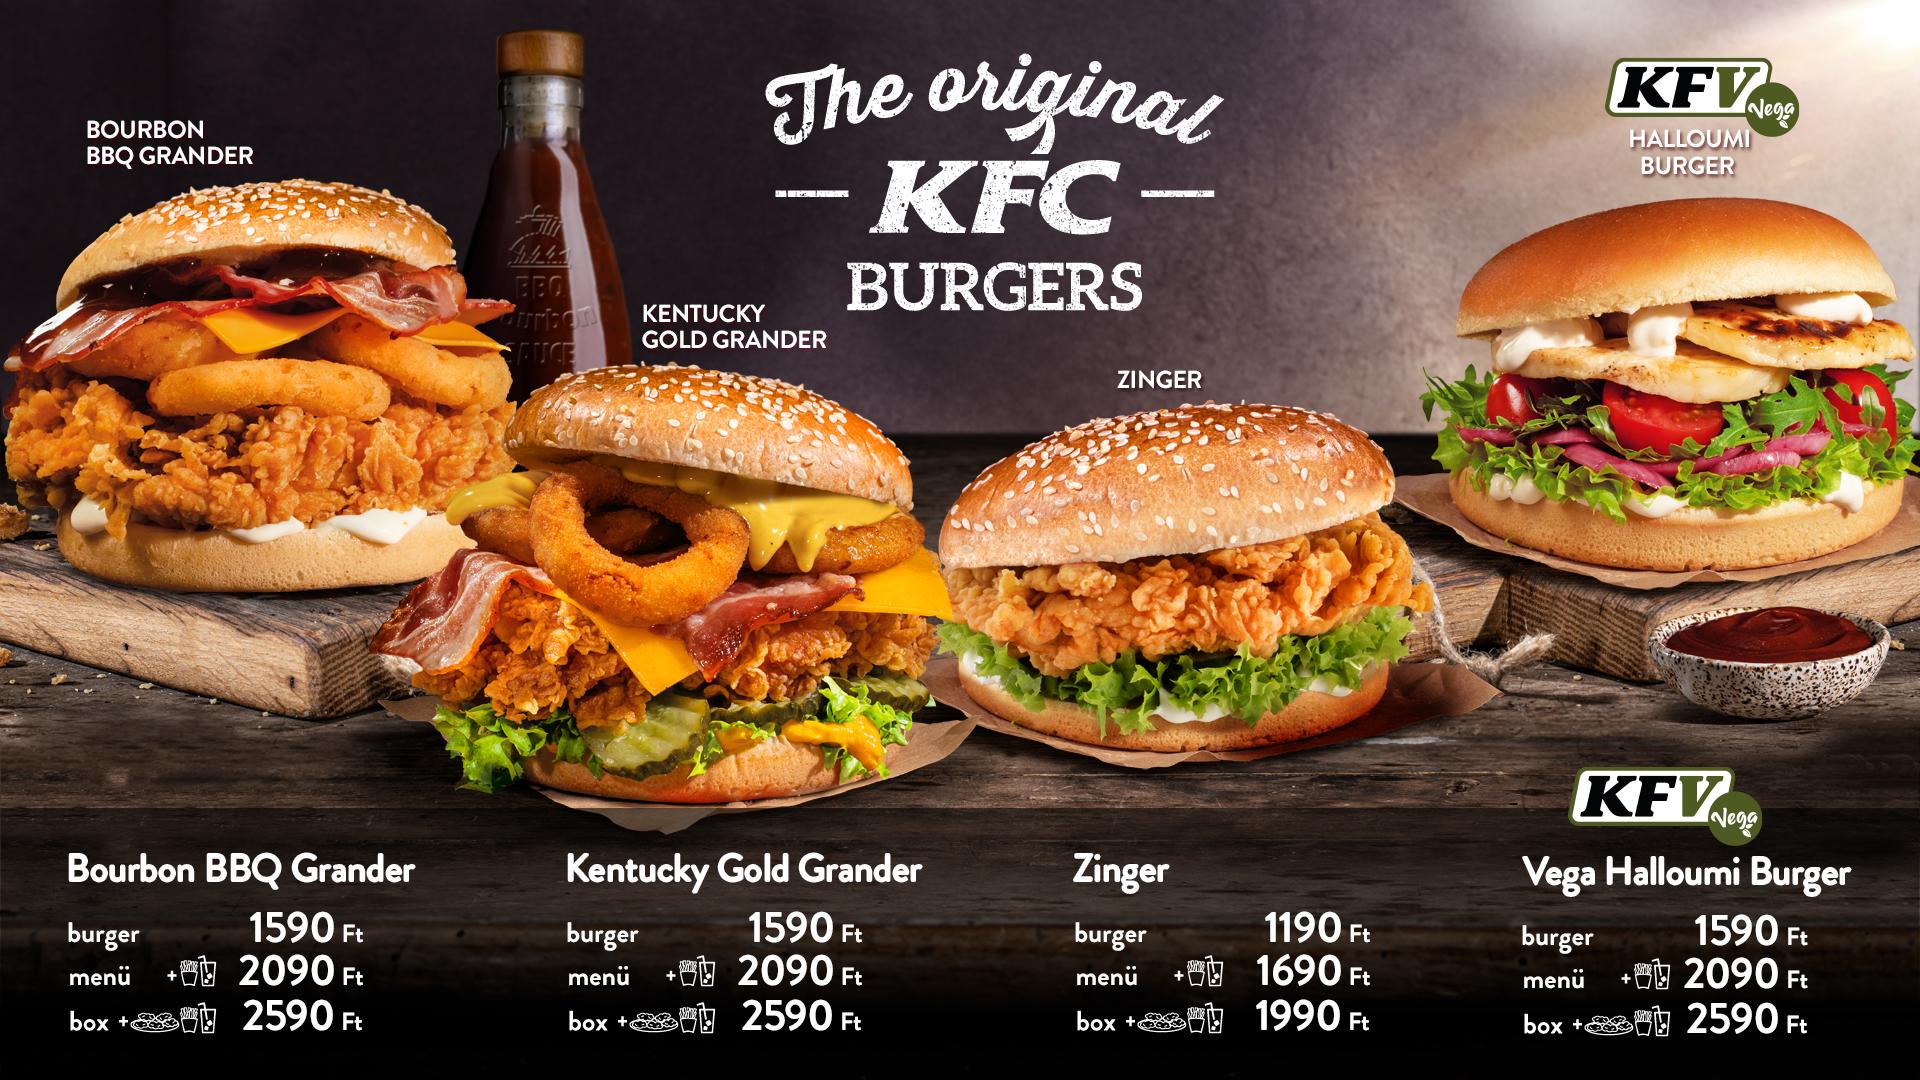 kfc_burgers_2020_dmb.png